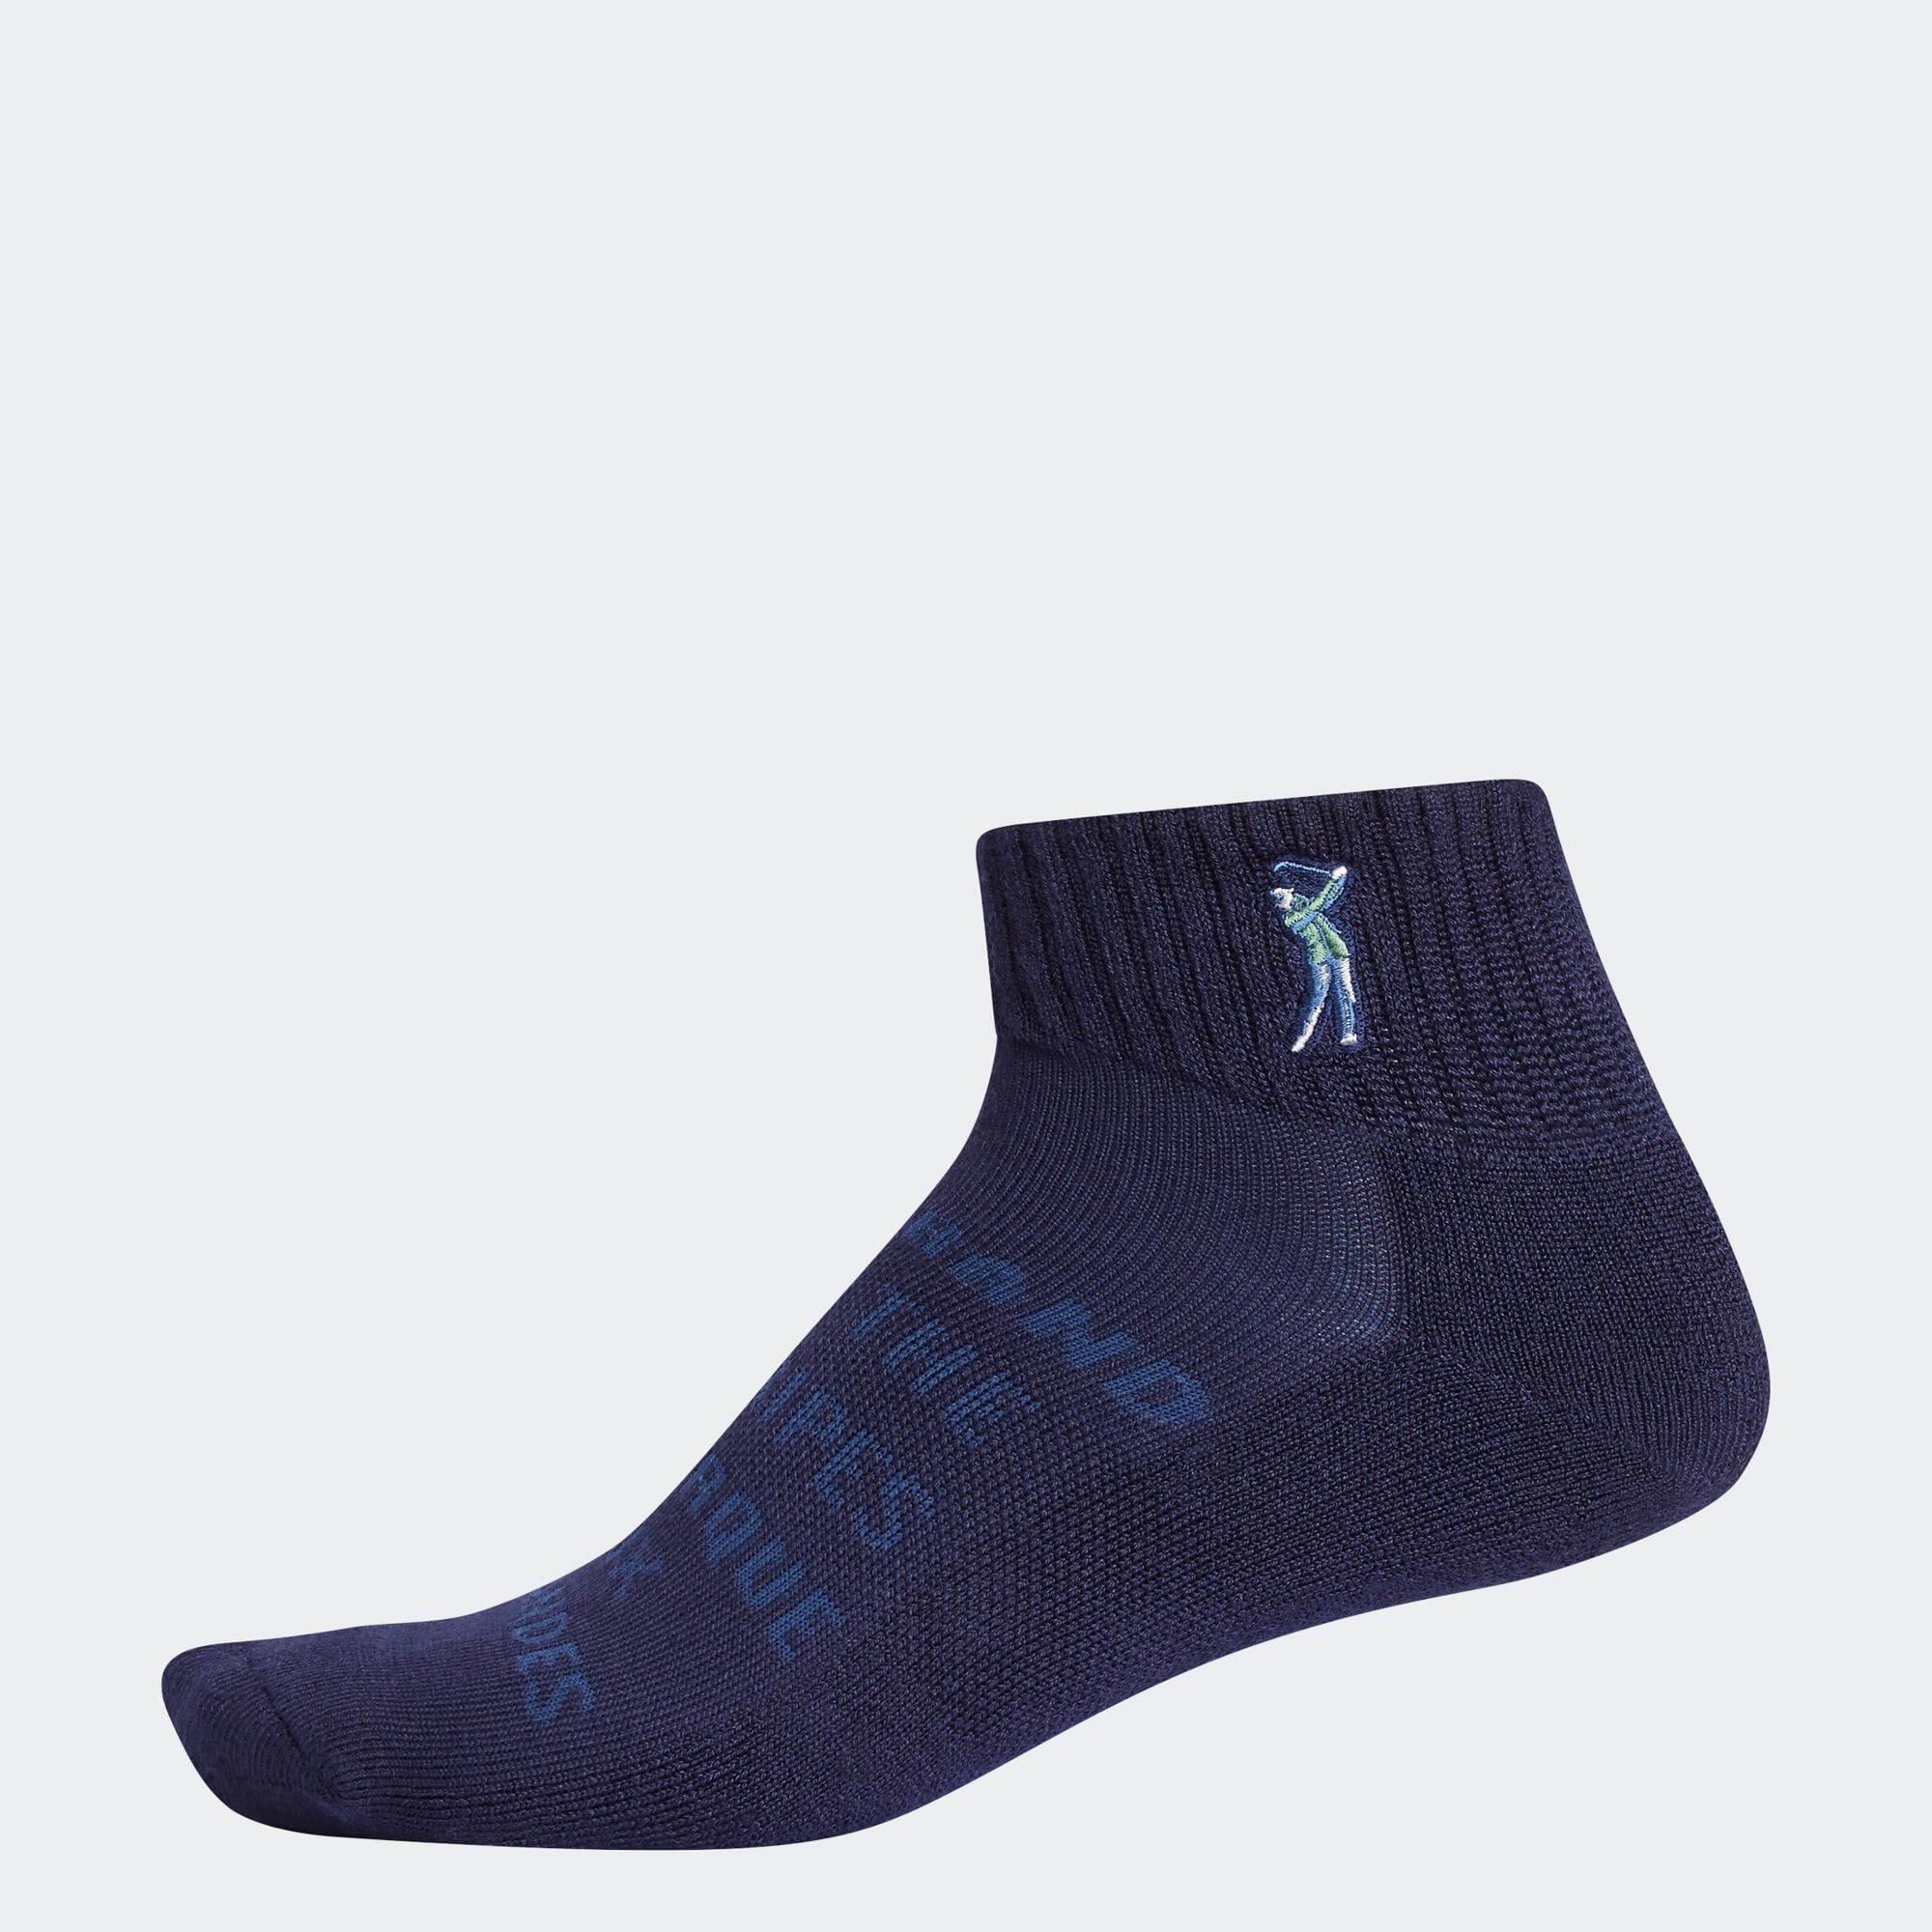 ADICROSS ウォームソソックスショート【ゴルフ】 / ADICROSS Warm Ankle Socks